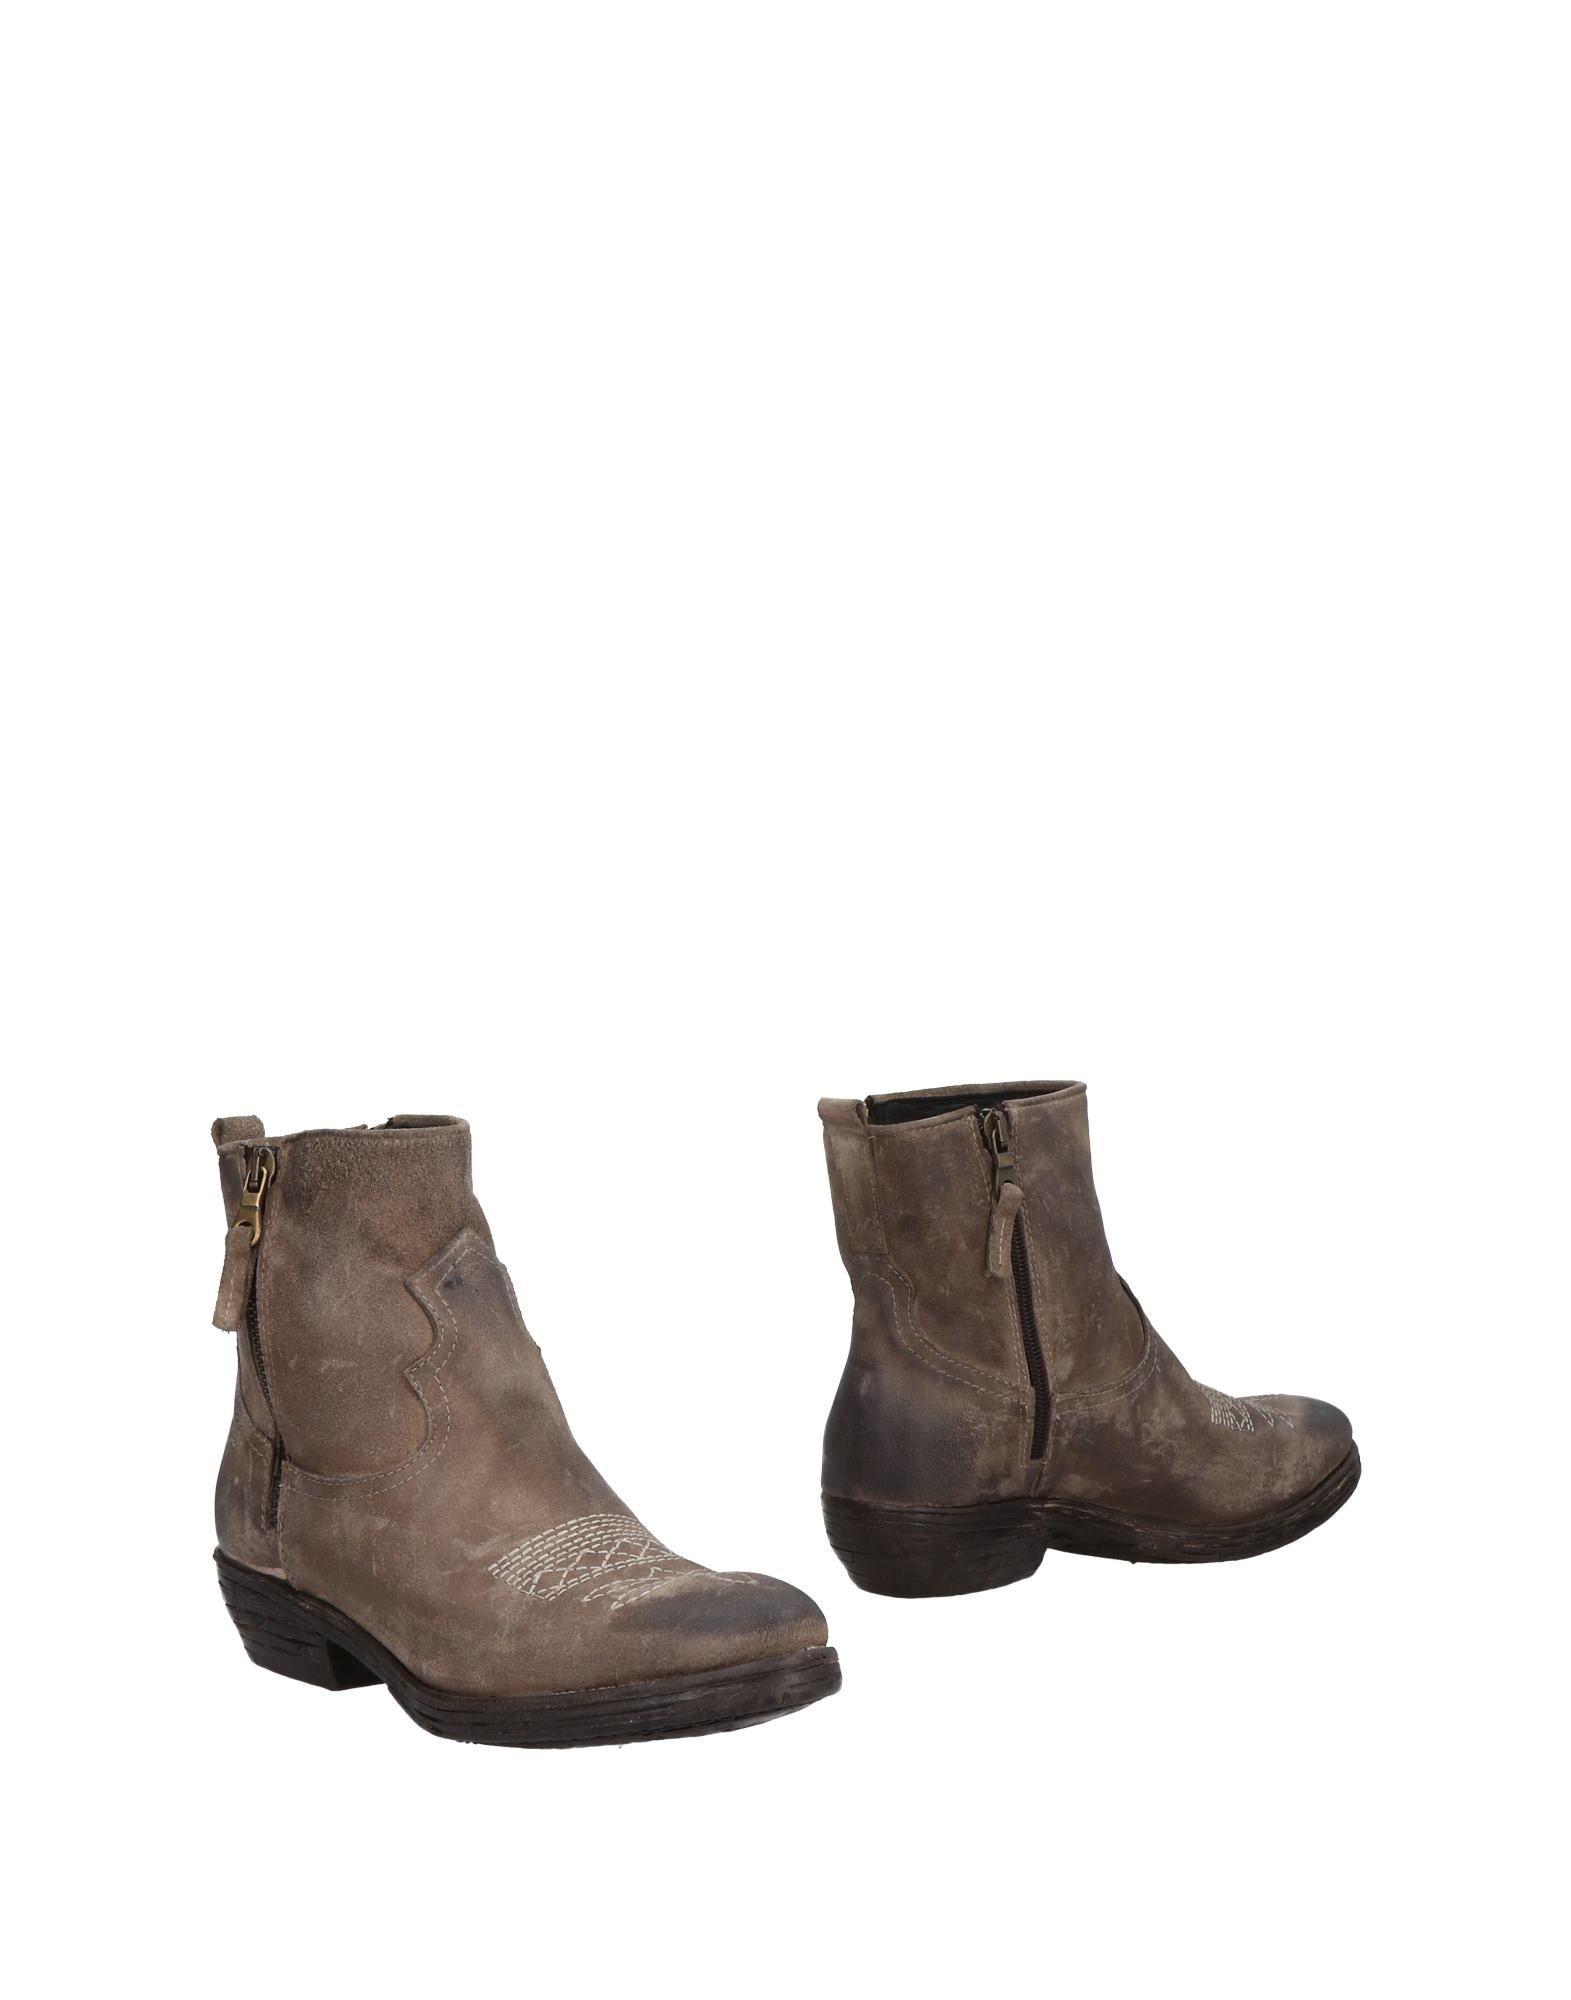 Zoe 11491311MH Stiefelette Damen  11491311MH Zoe Gute Qualität beliebte Schuhe 413506